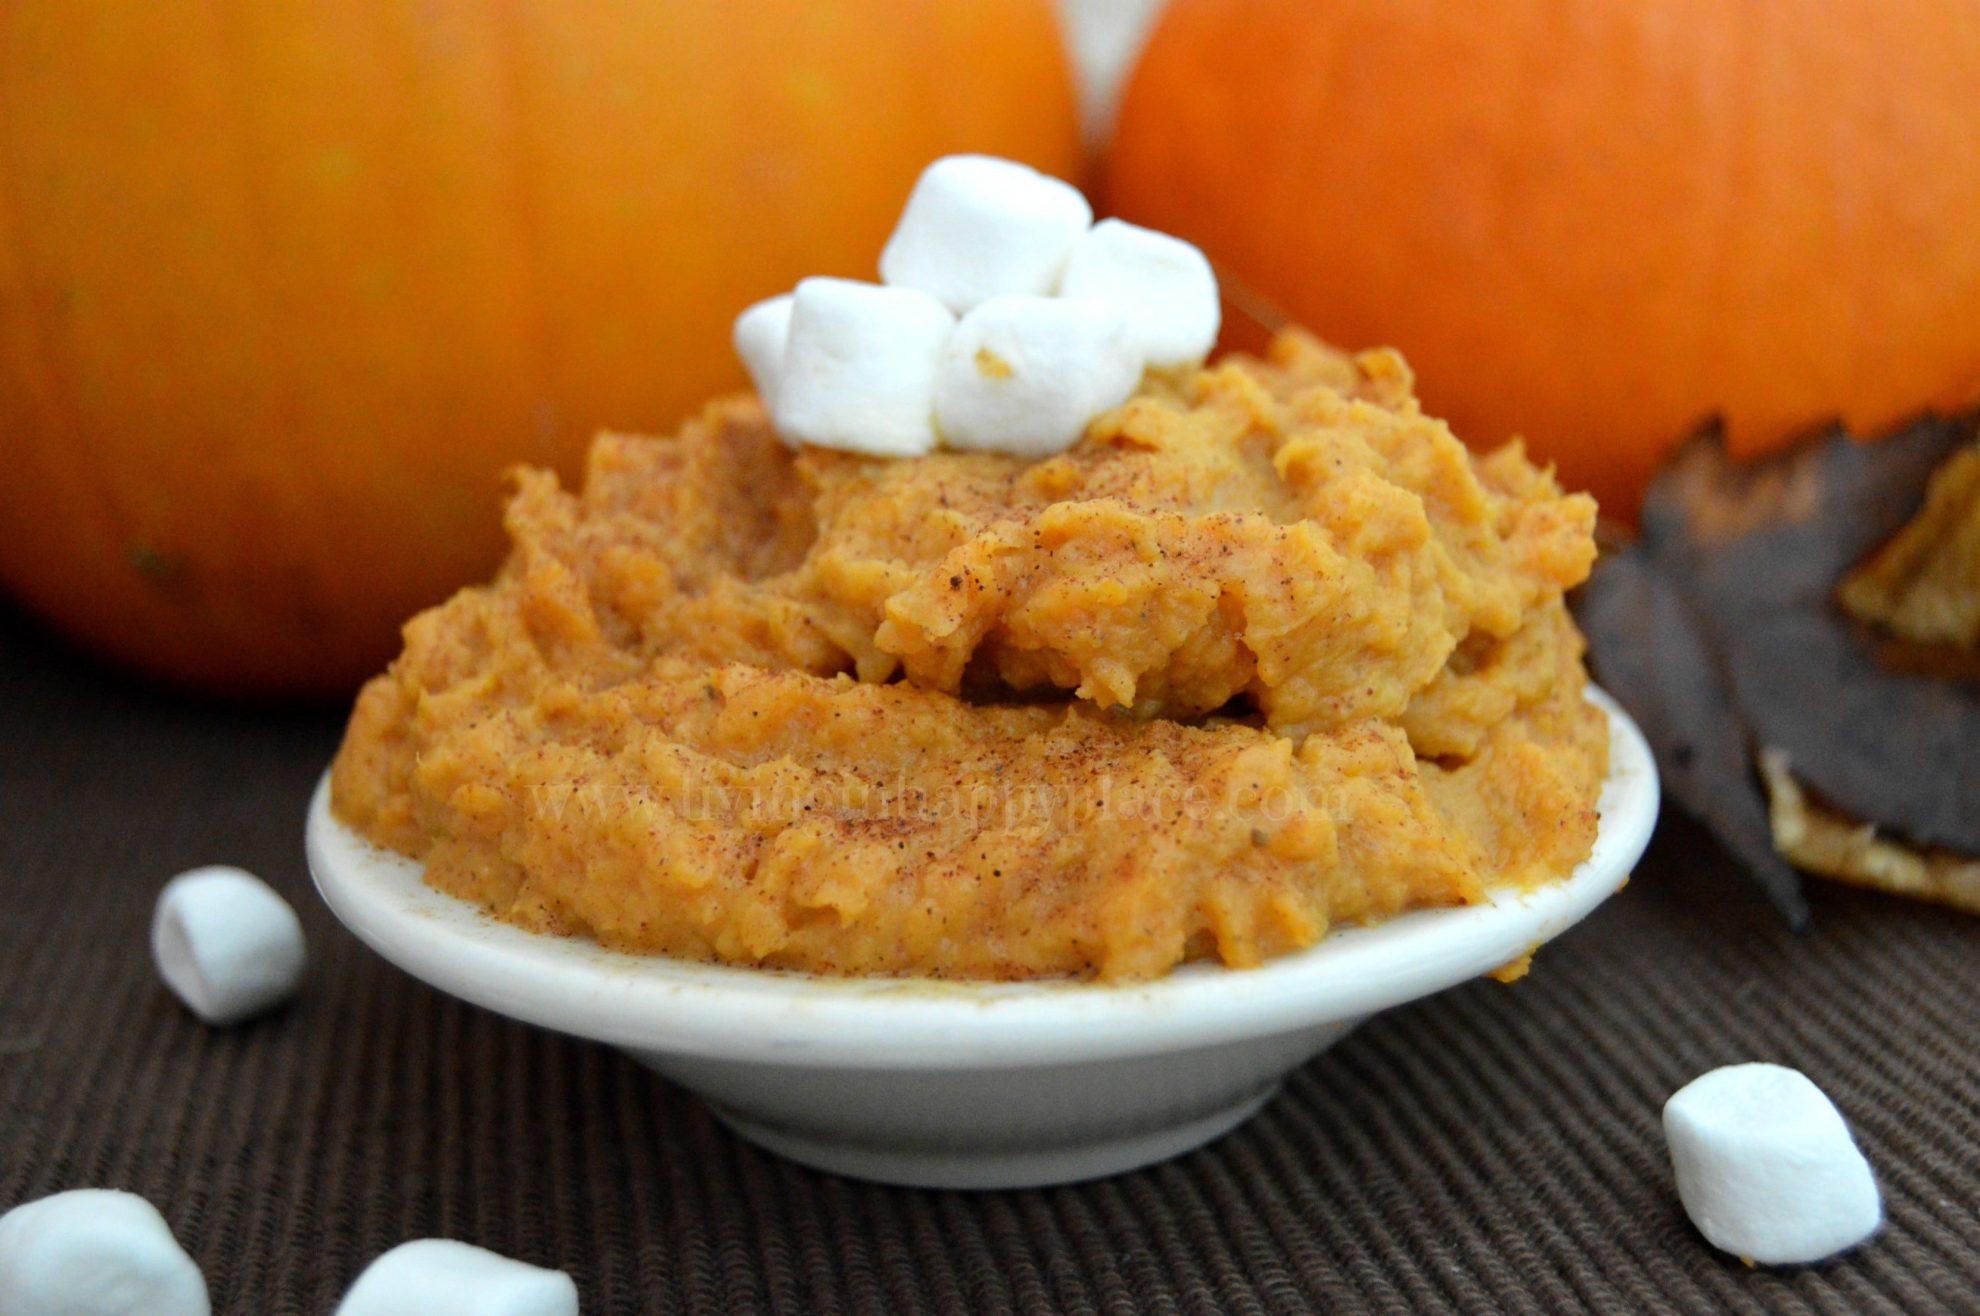 Pumpkin Pie mashed sweet potatoes recipe